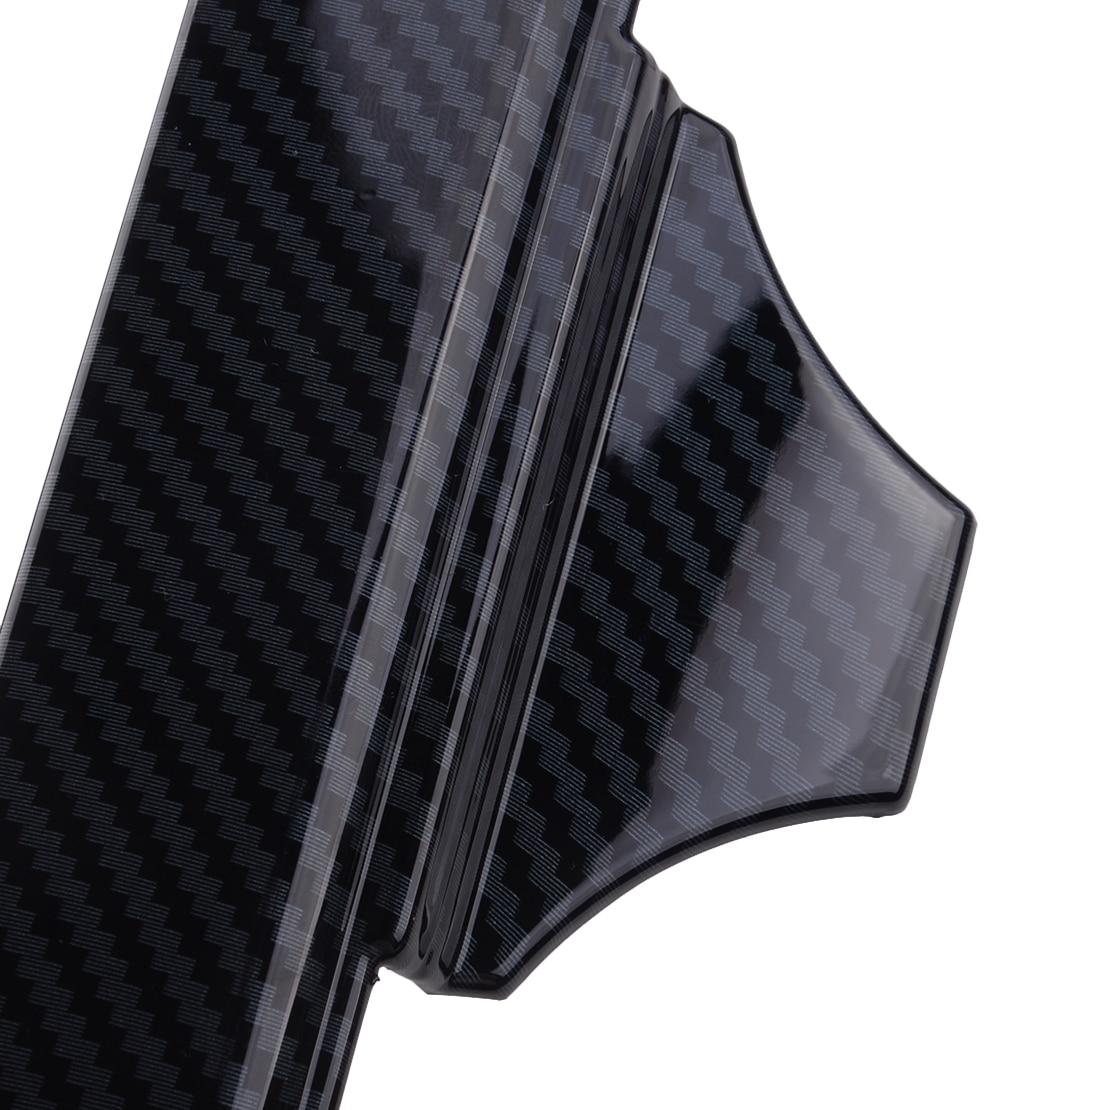 New Carbon Fiber Style ABS Car Rear Armrest Box Cup Holder Cover Trim Frame Fit for Ford F150 2016 2017 2018 2019 enlarge